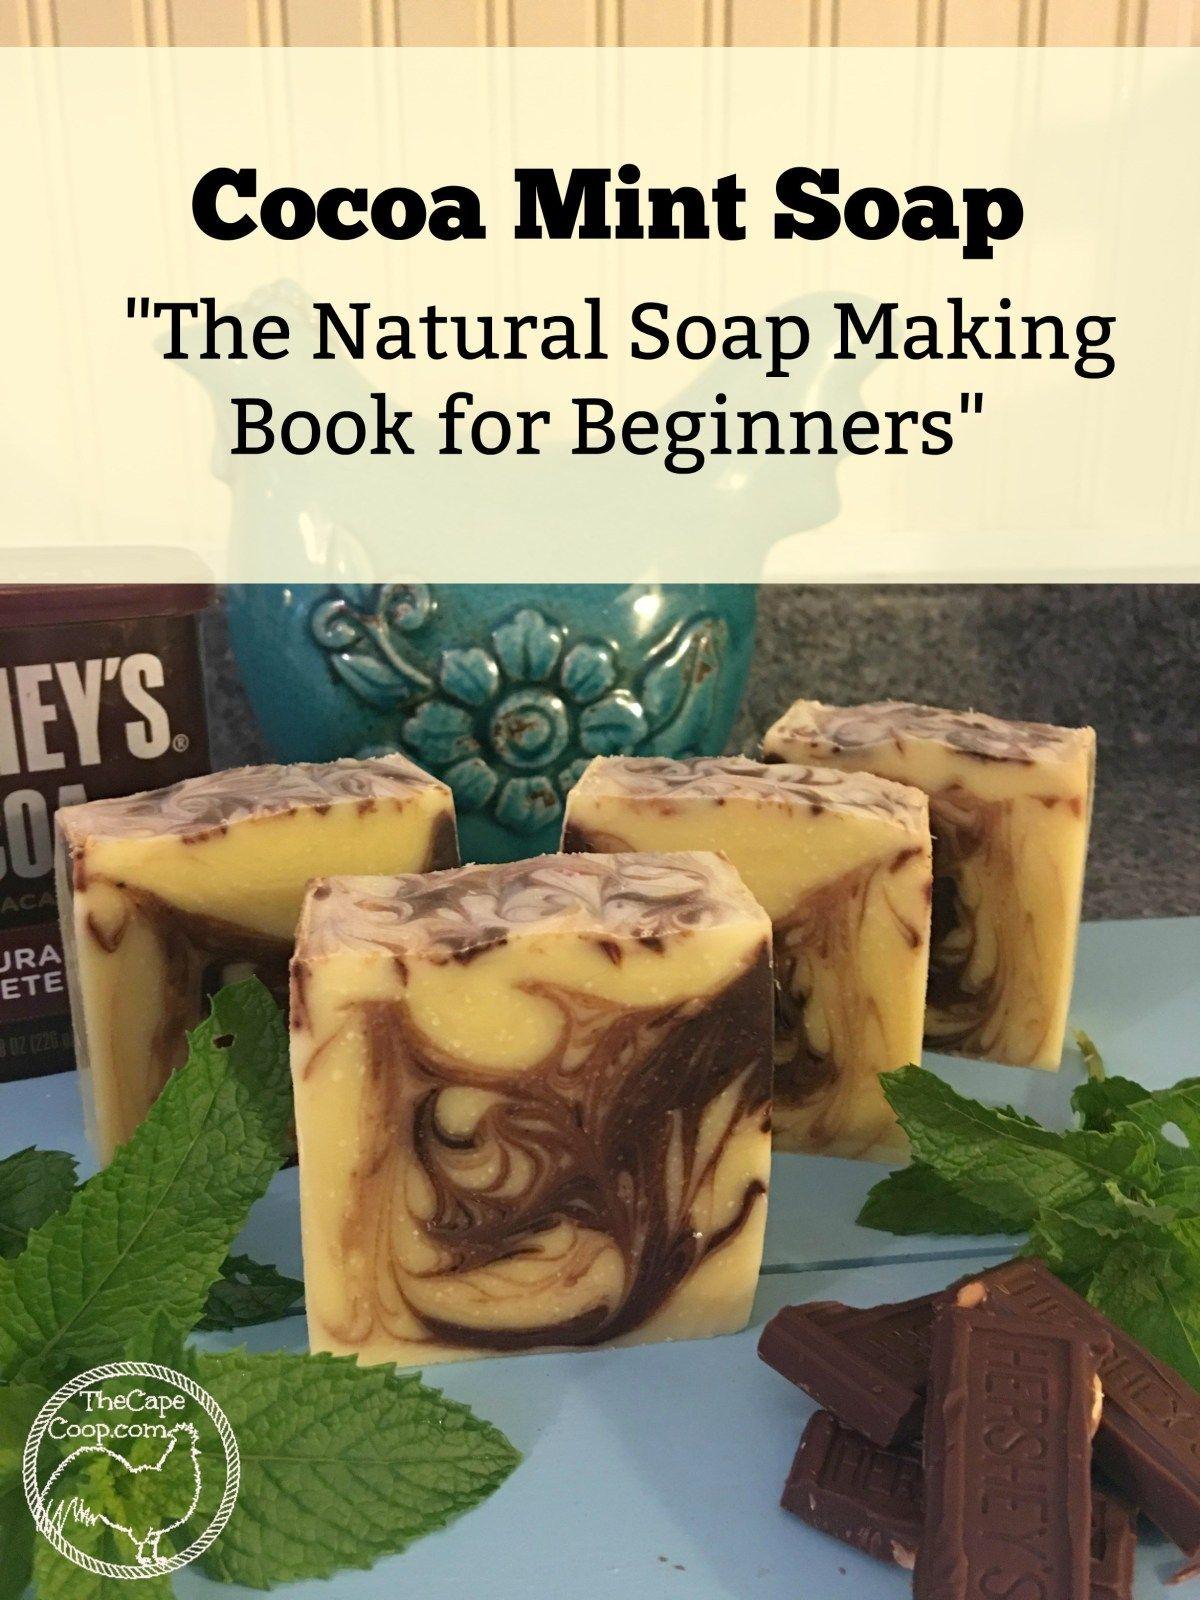 Cocoa mint soap recipe the natural soap making book